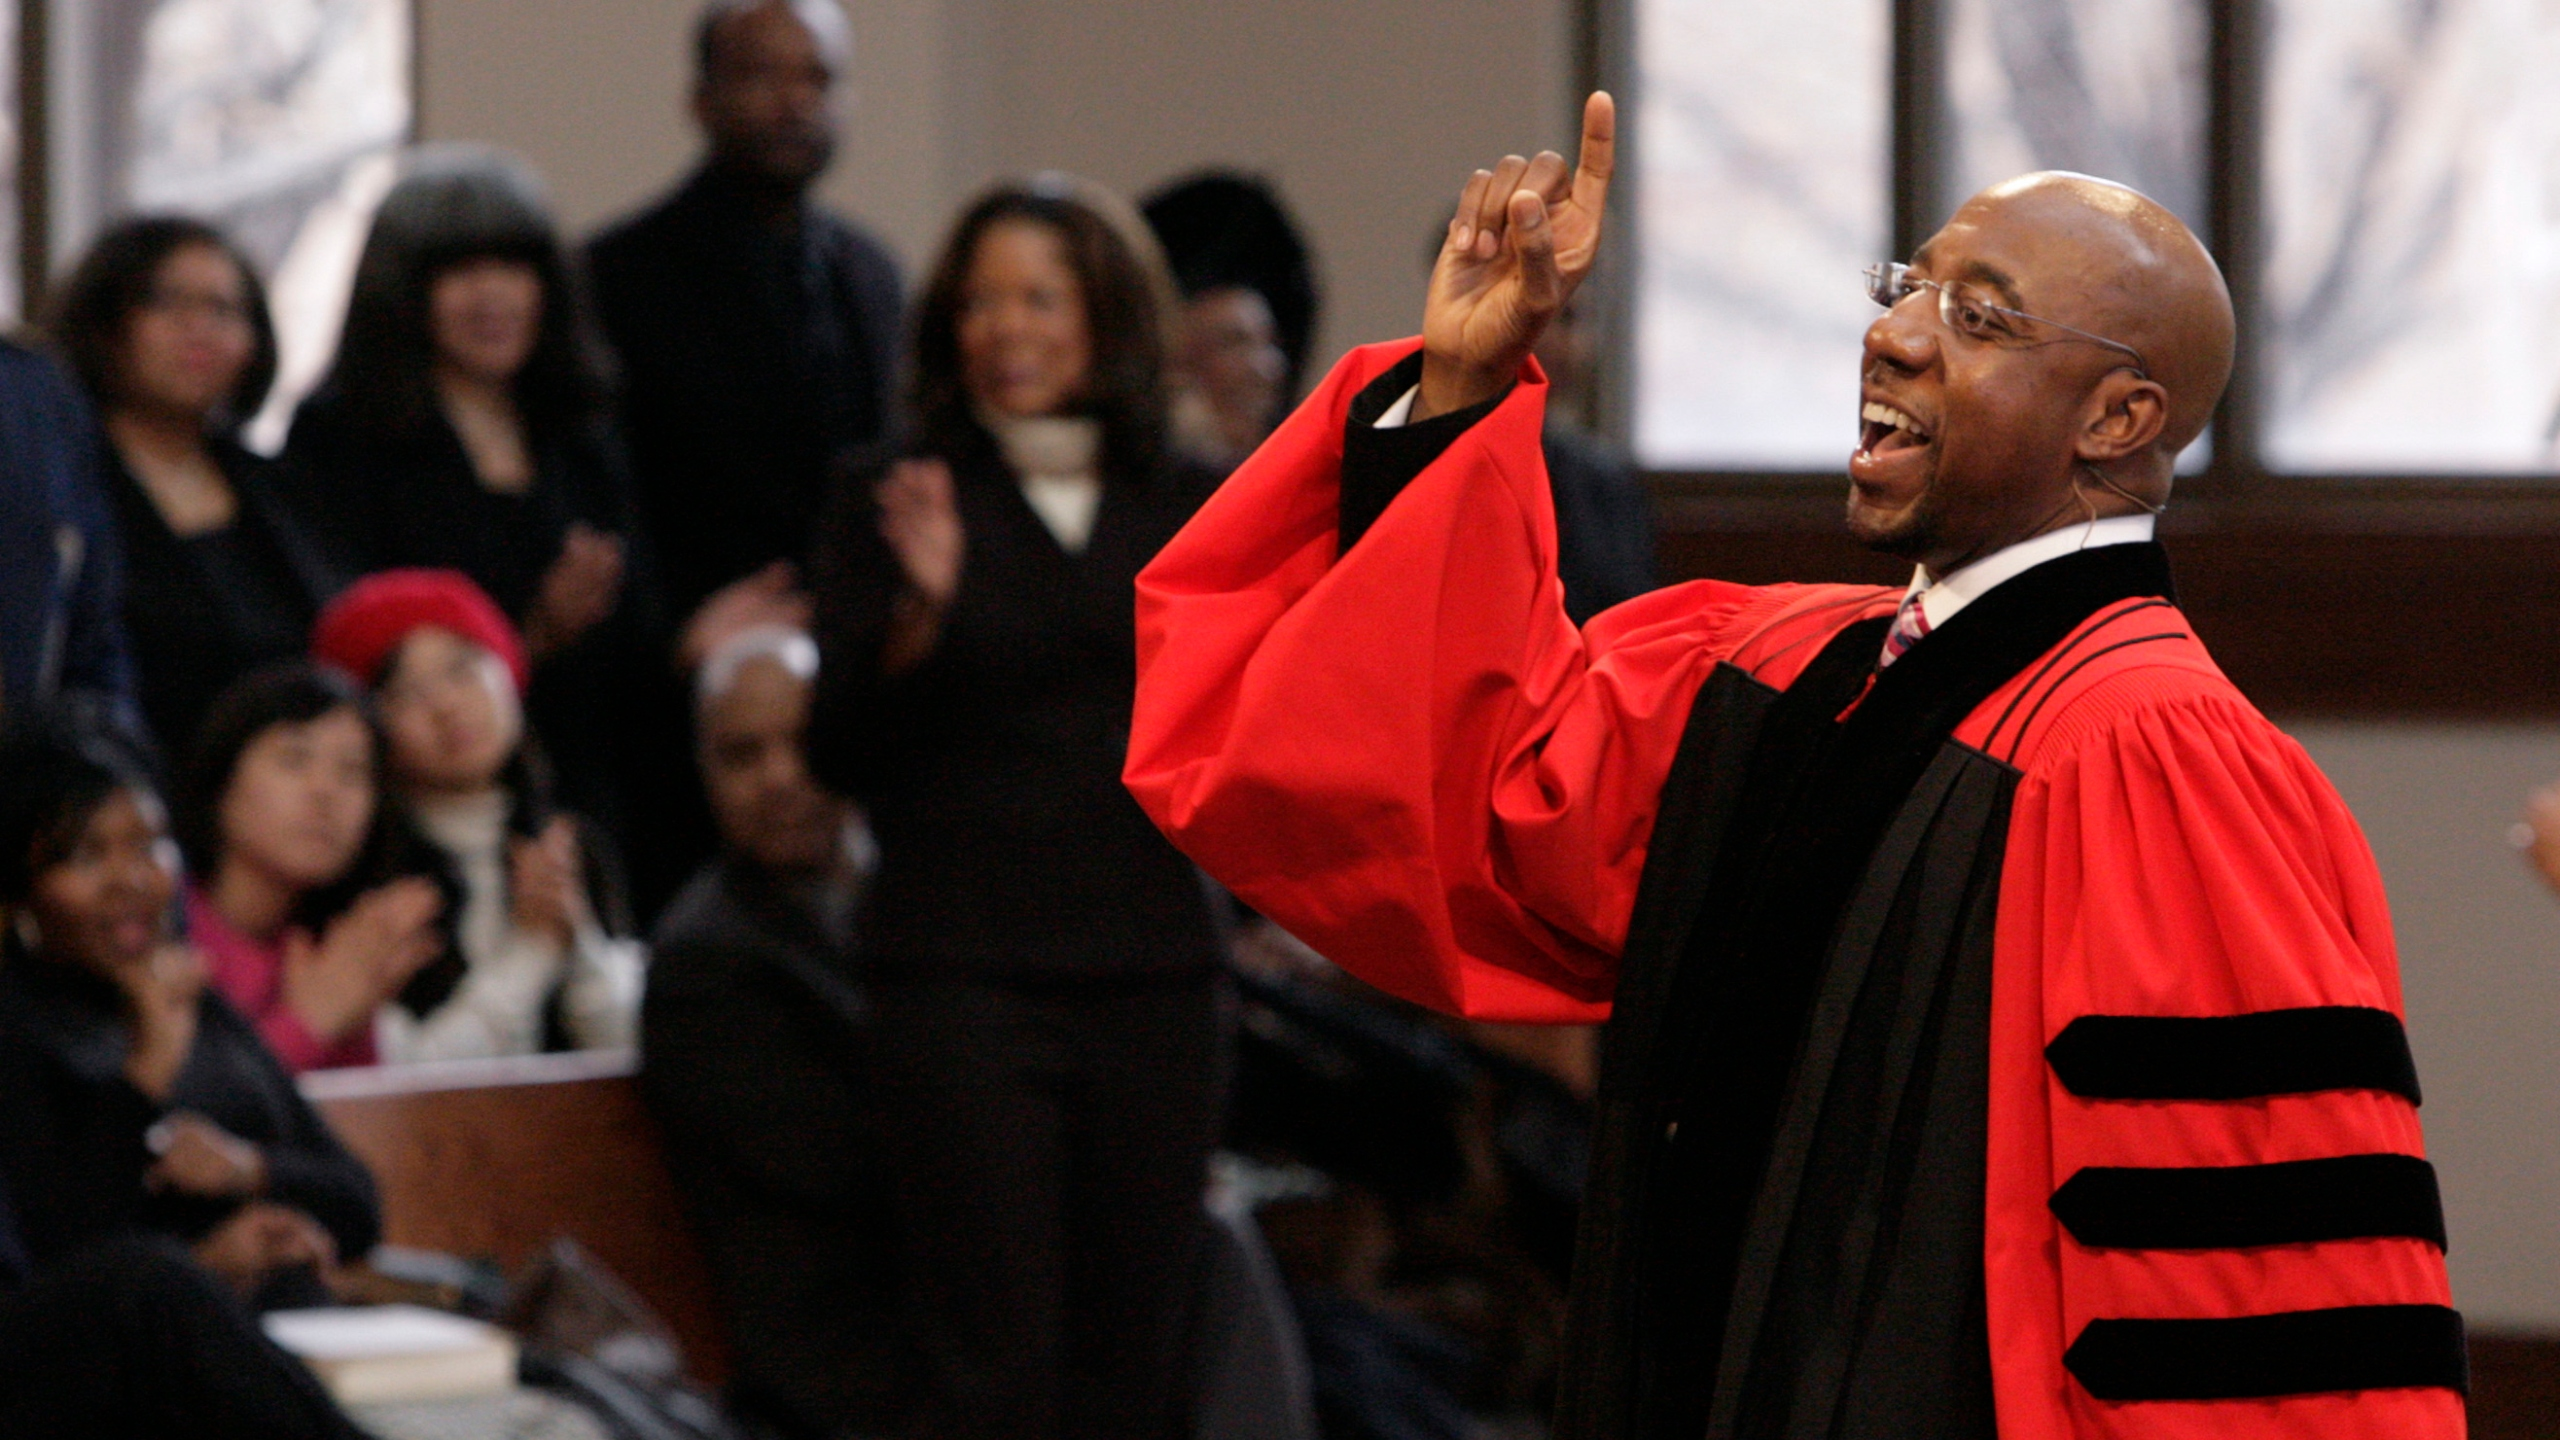 Senate race in Georgia thrusts 'Black America's church' into spotlight |  KTLA